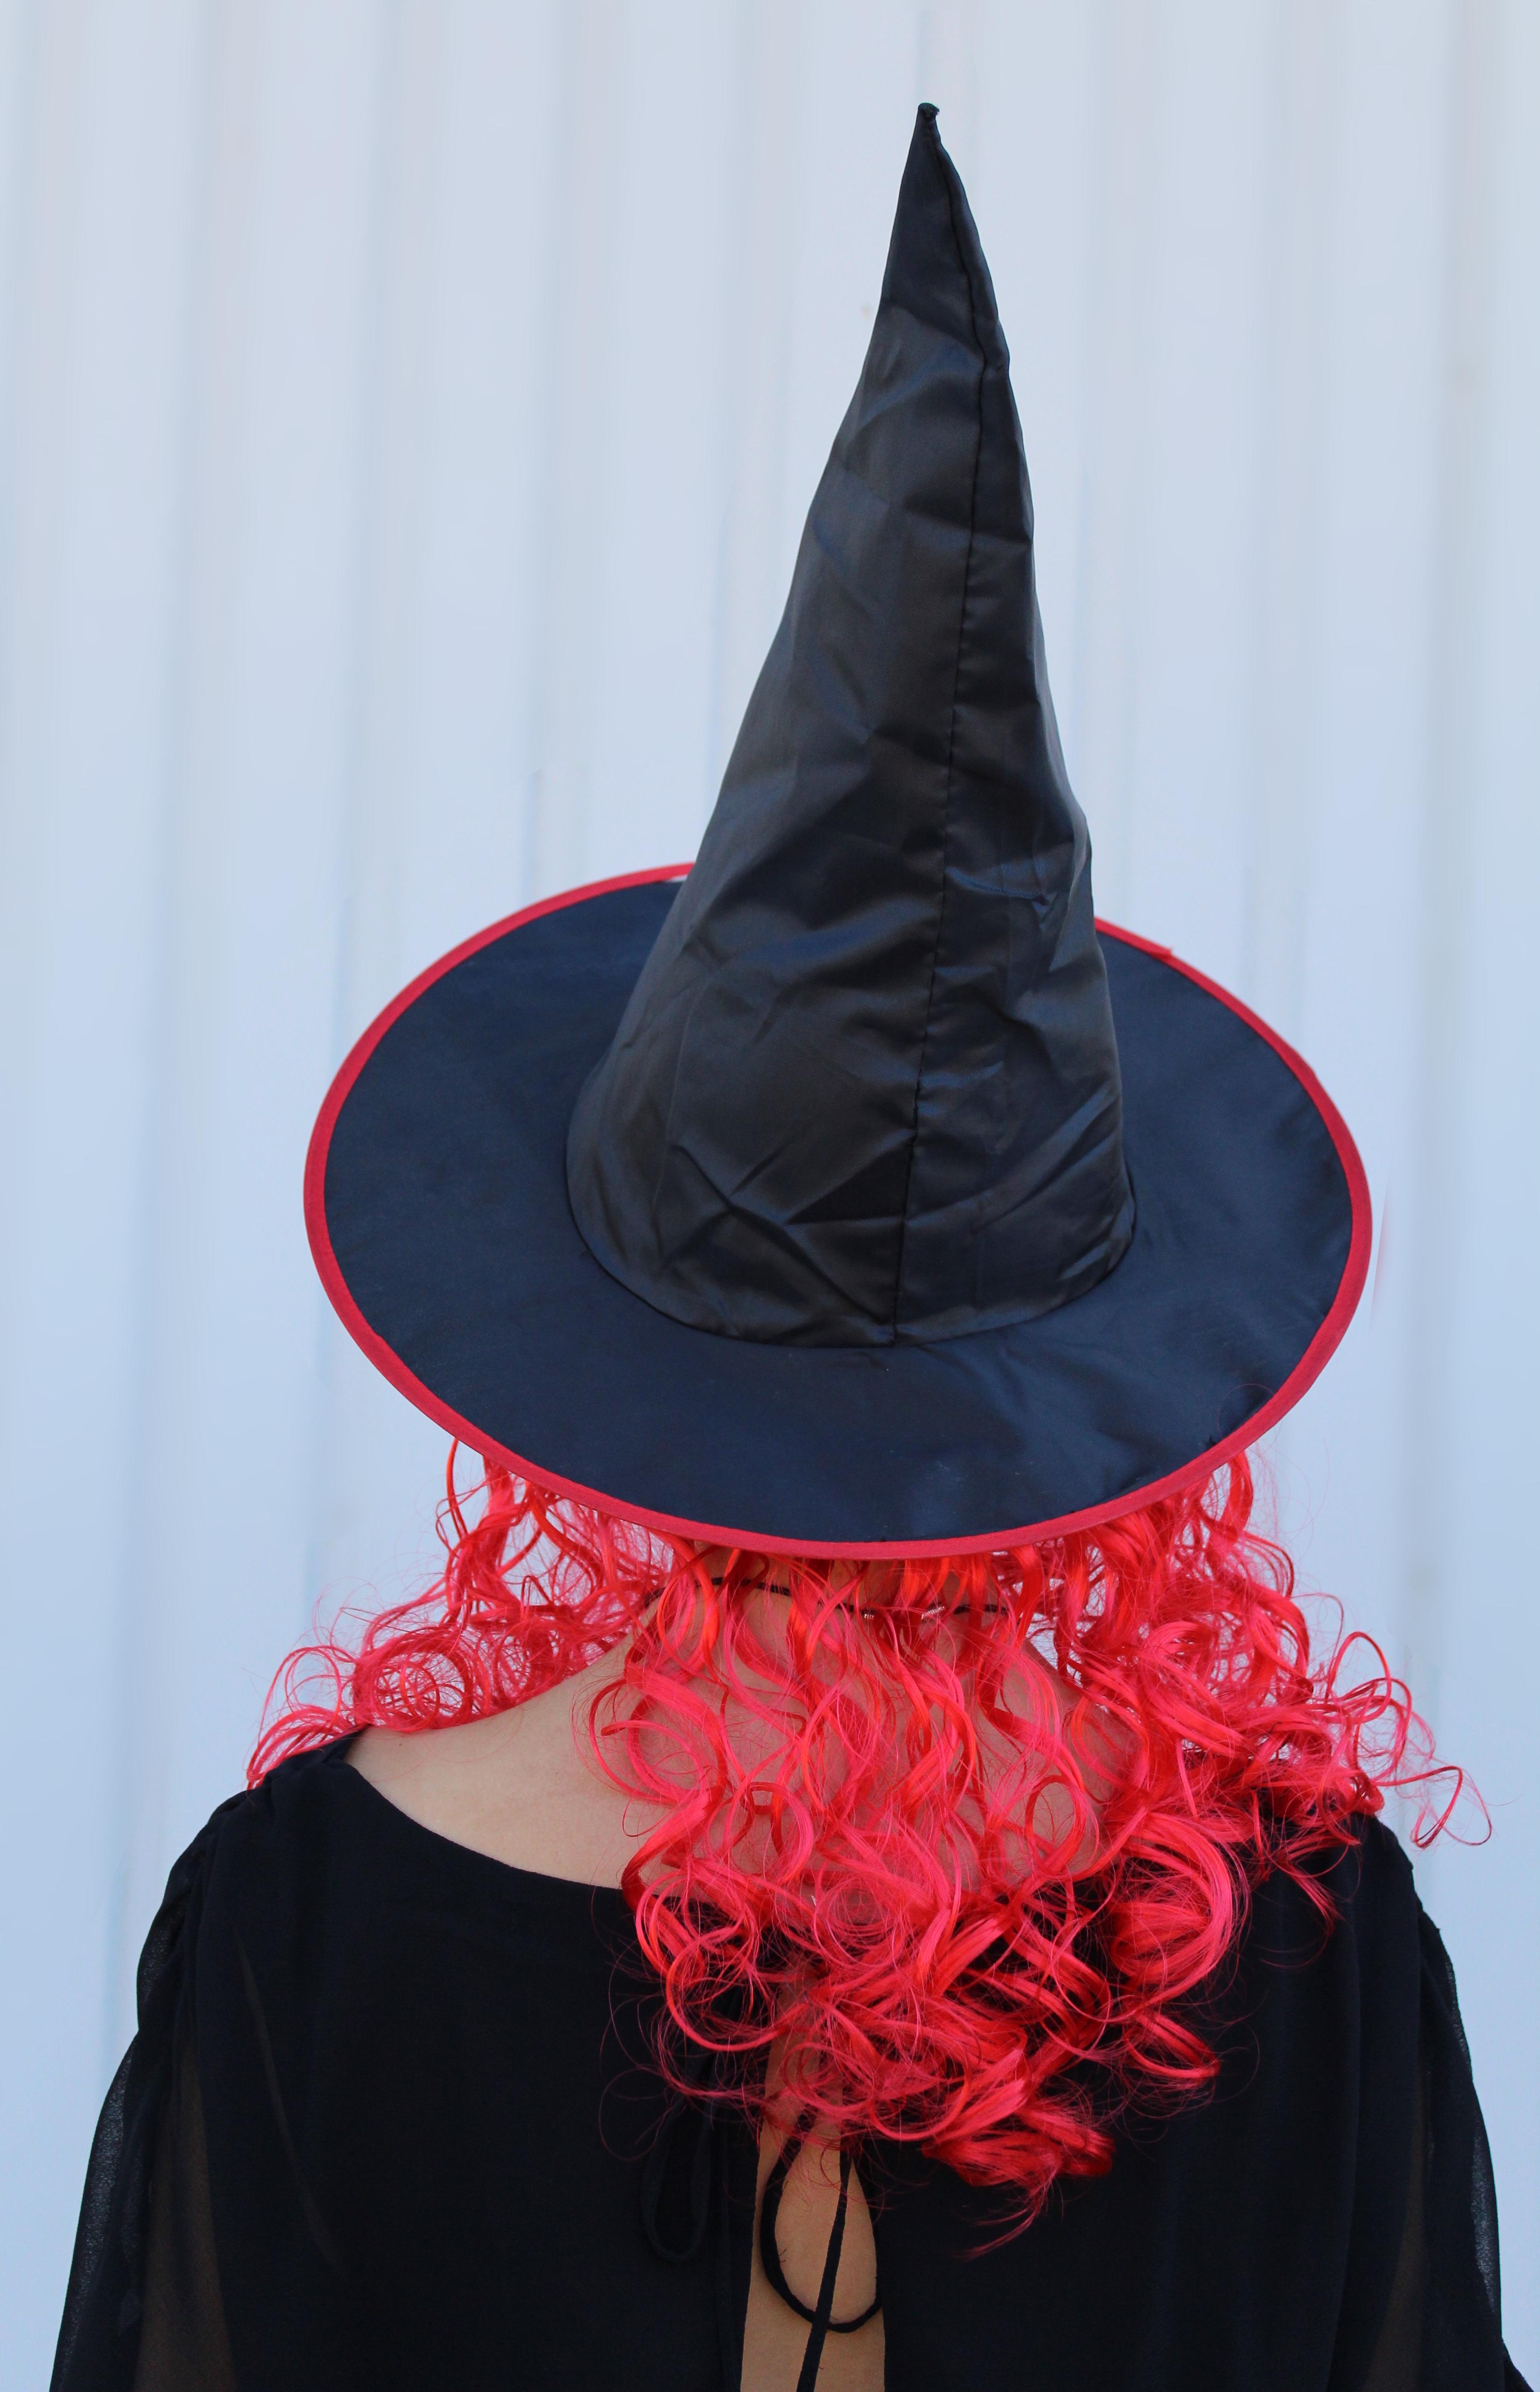 Hexenhut Mit Haar Sortierte Farben Hut Mit Haaren Halloween